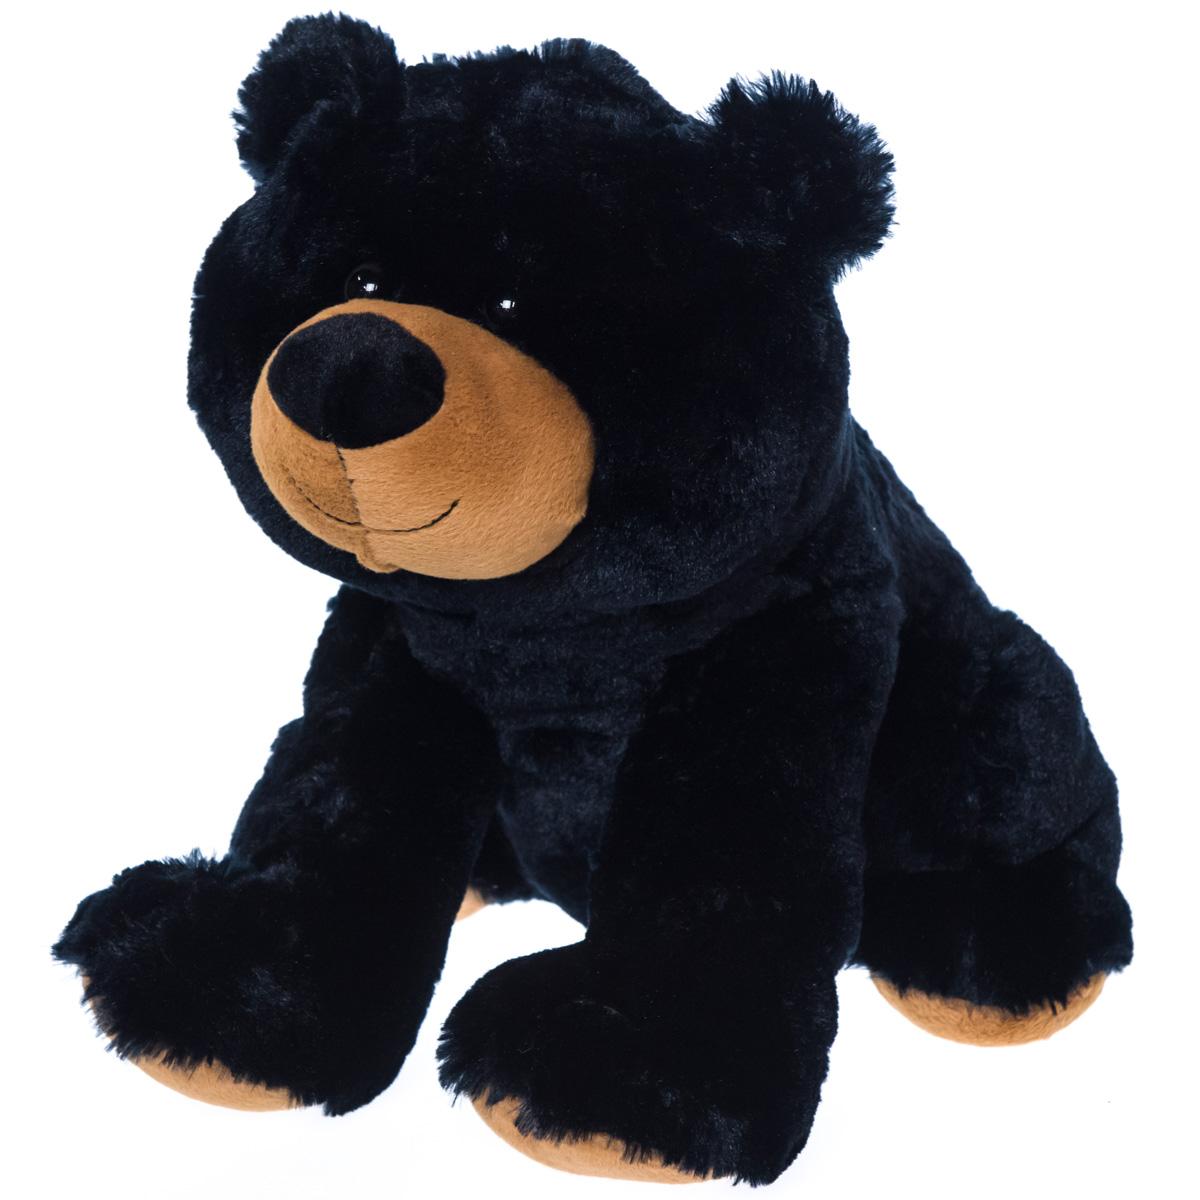 Shop Crackerbarrel Com Sitting Plush Black Bear Cracker Barrel